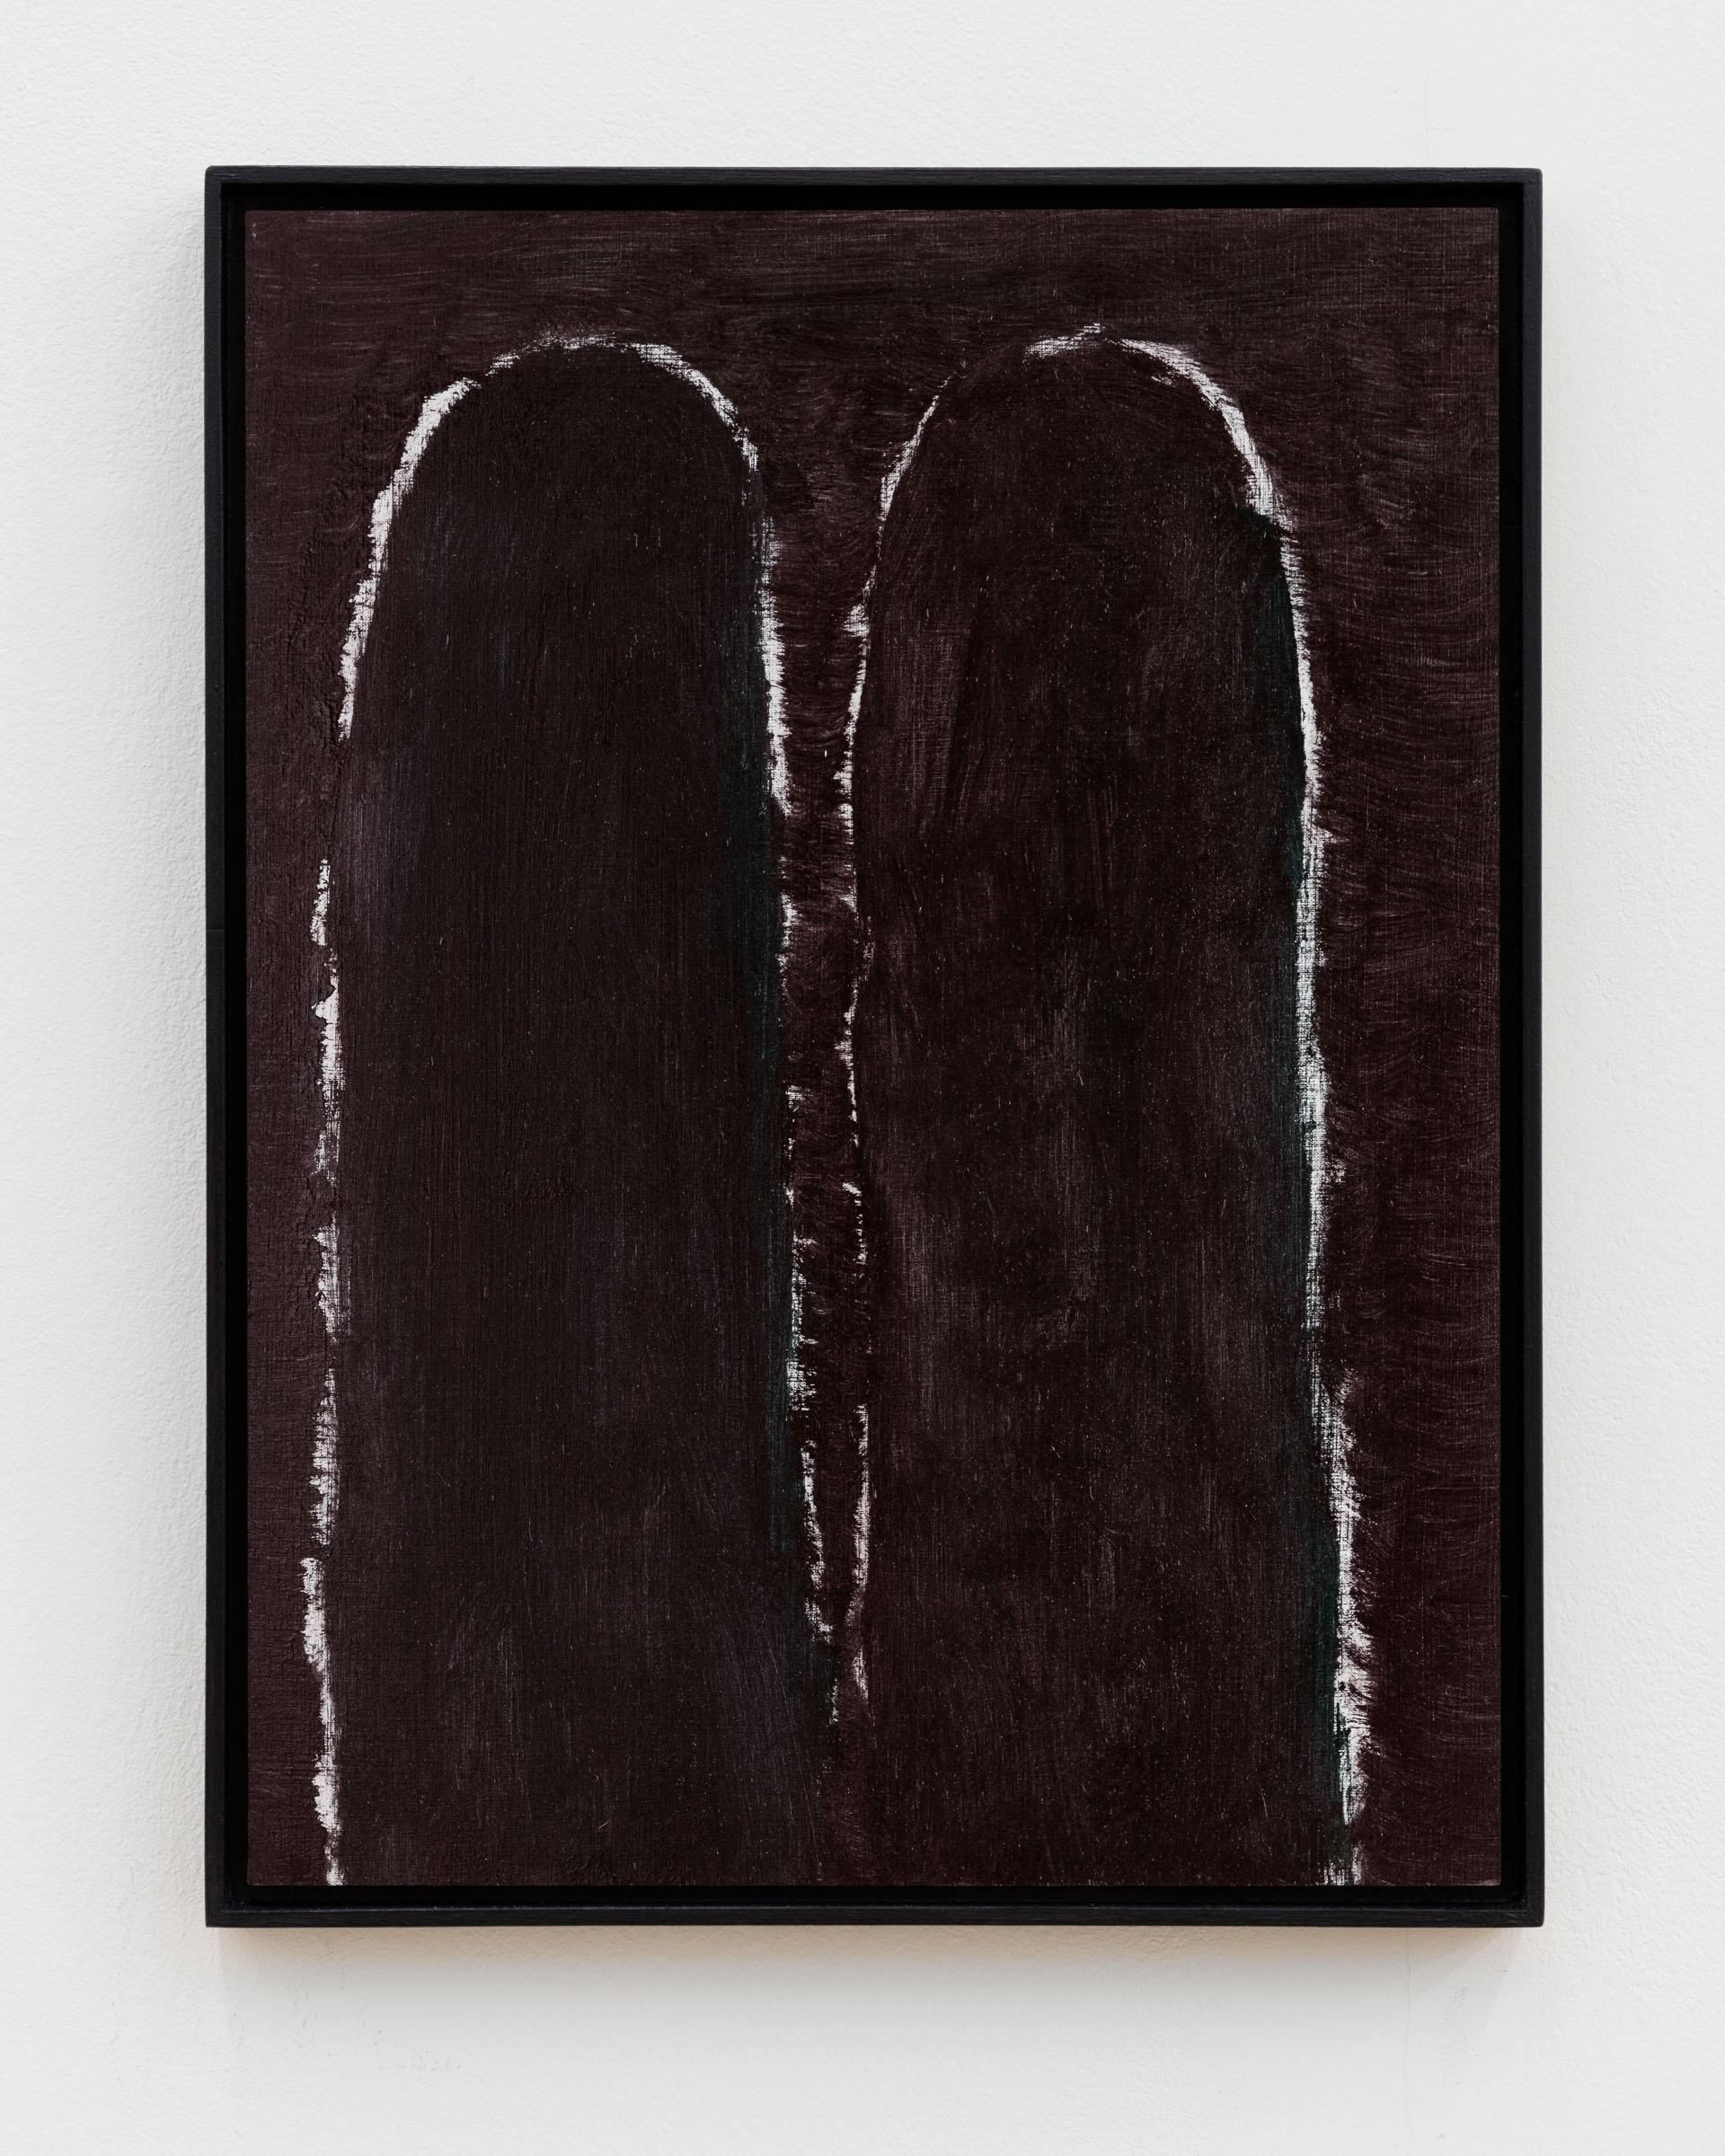 Veronika Hilger: Untitled, 2018, oil on paper on MDF in artists frame, 39,7 x 29,7 cm